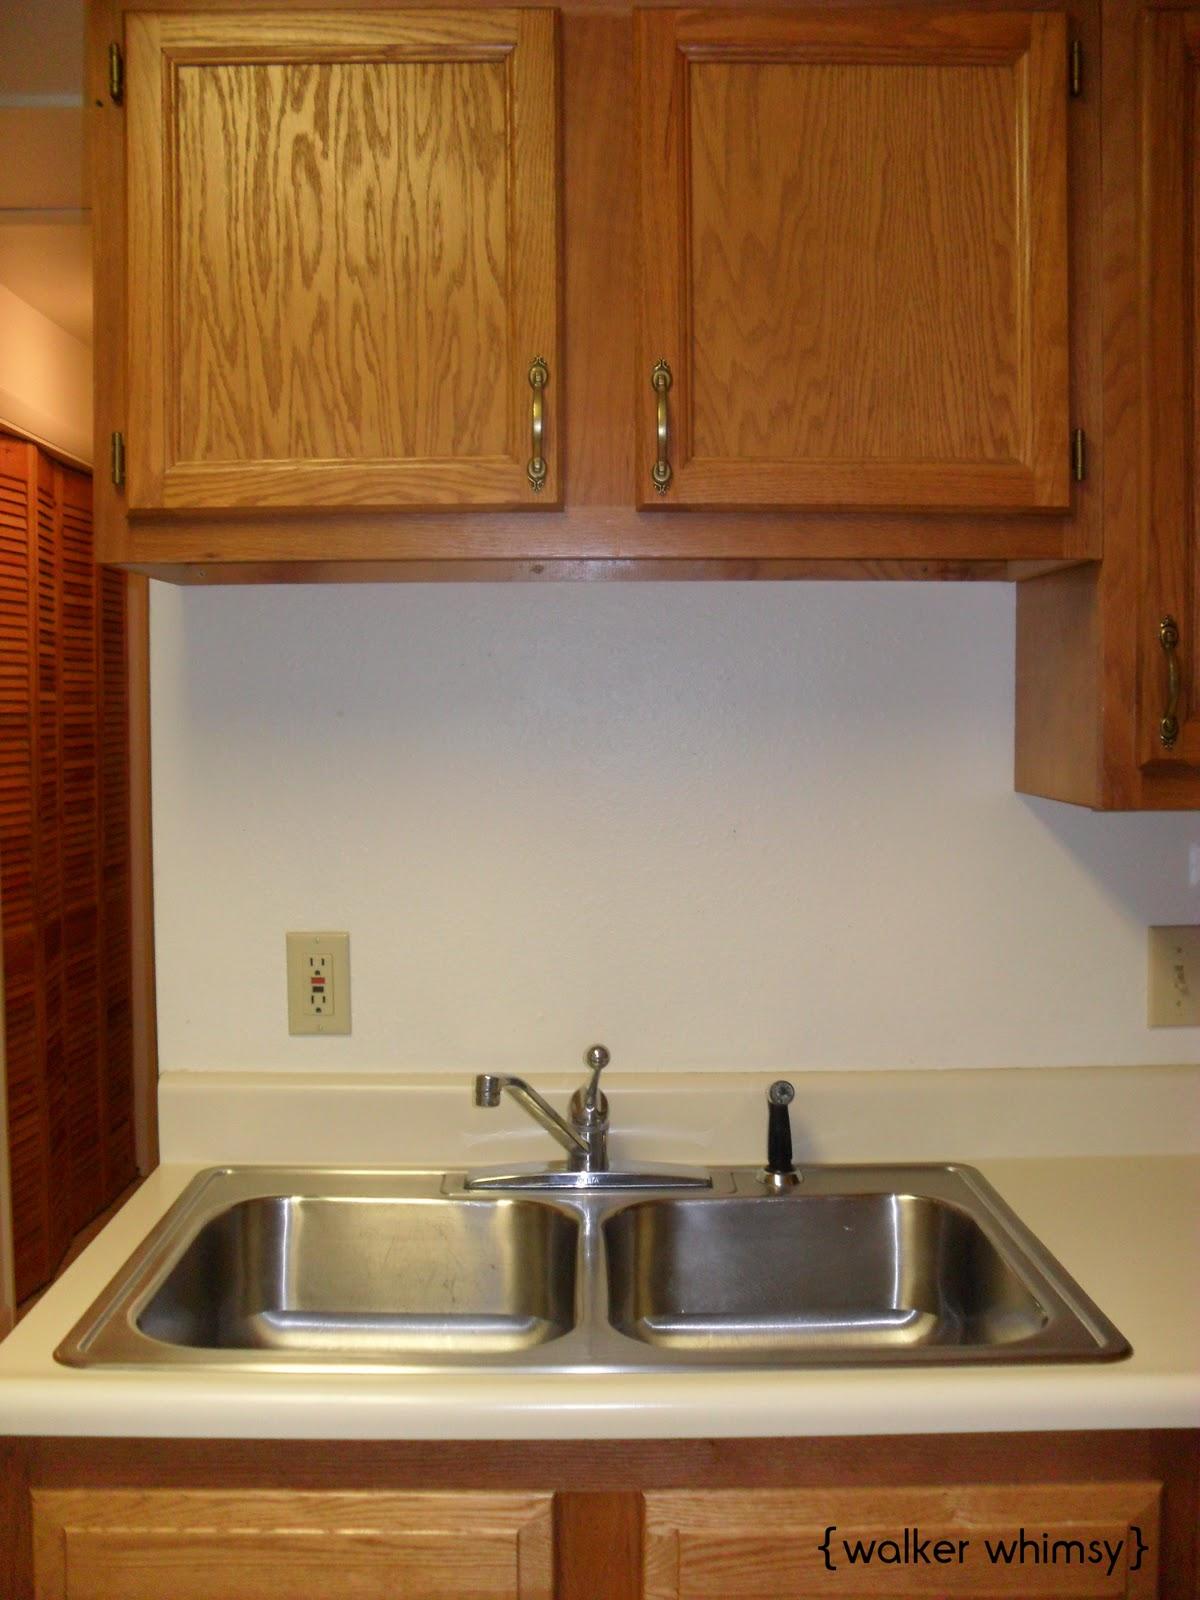 Kitchen Sink Randomly Stops Working